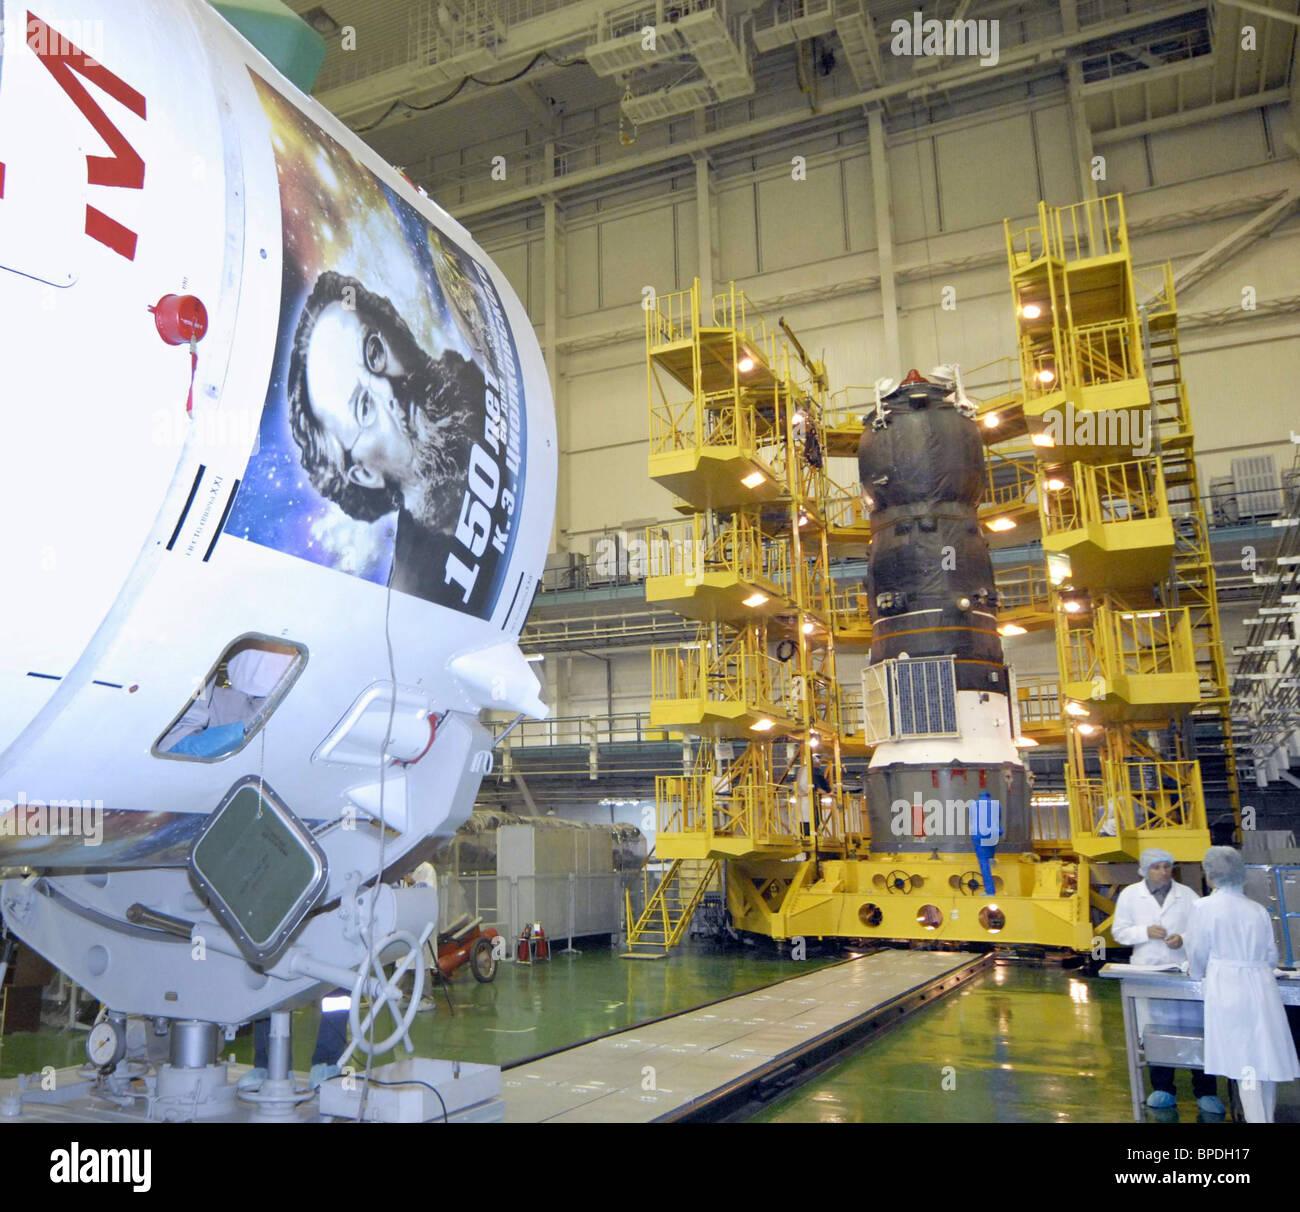 Soyuz-U booster rocket with Progress M-61 cargo spaceship blasts off from Baikonur Cosmodrome in Kazakhstan - Stock Image